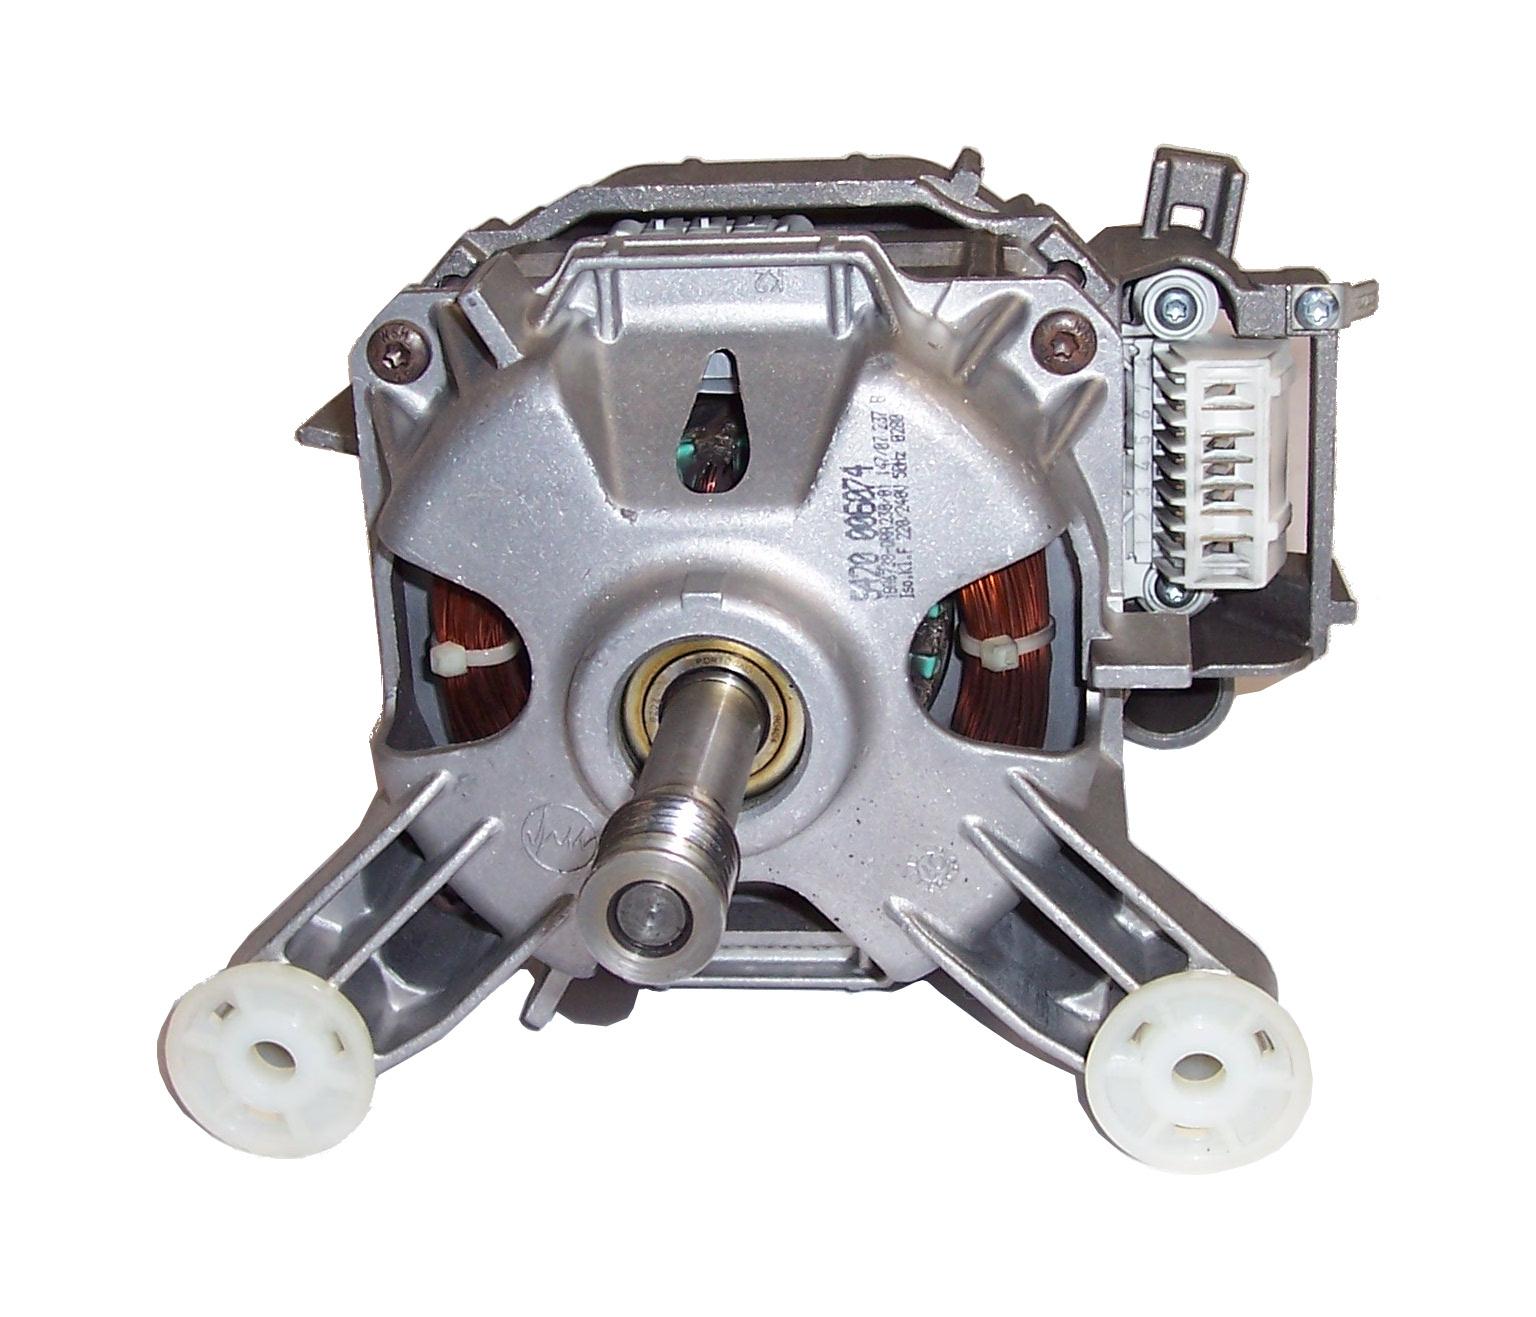 Bosch waa24161gb 01 washing machine motor 5420006074 for Motor for bosch washing machine